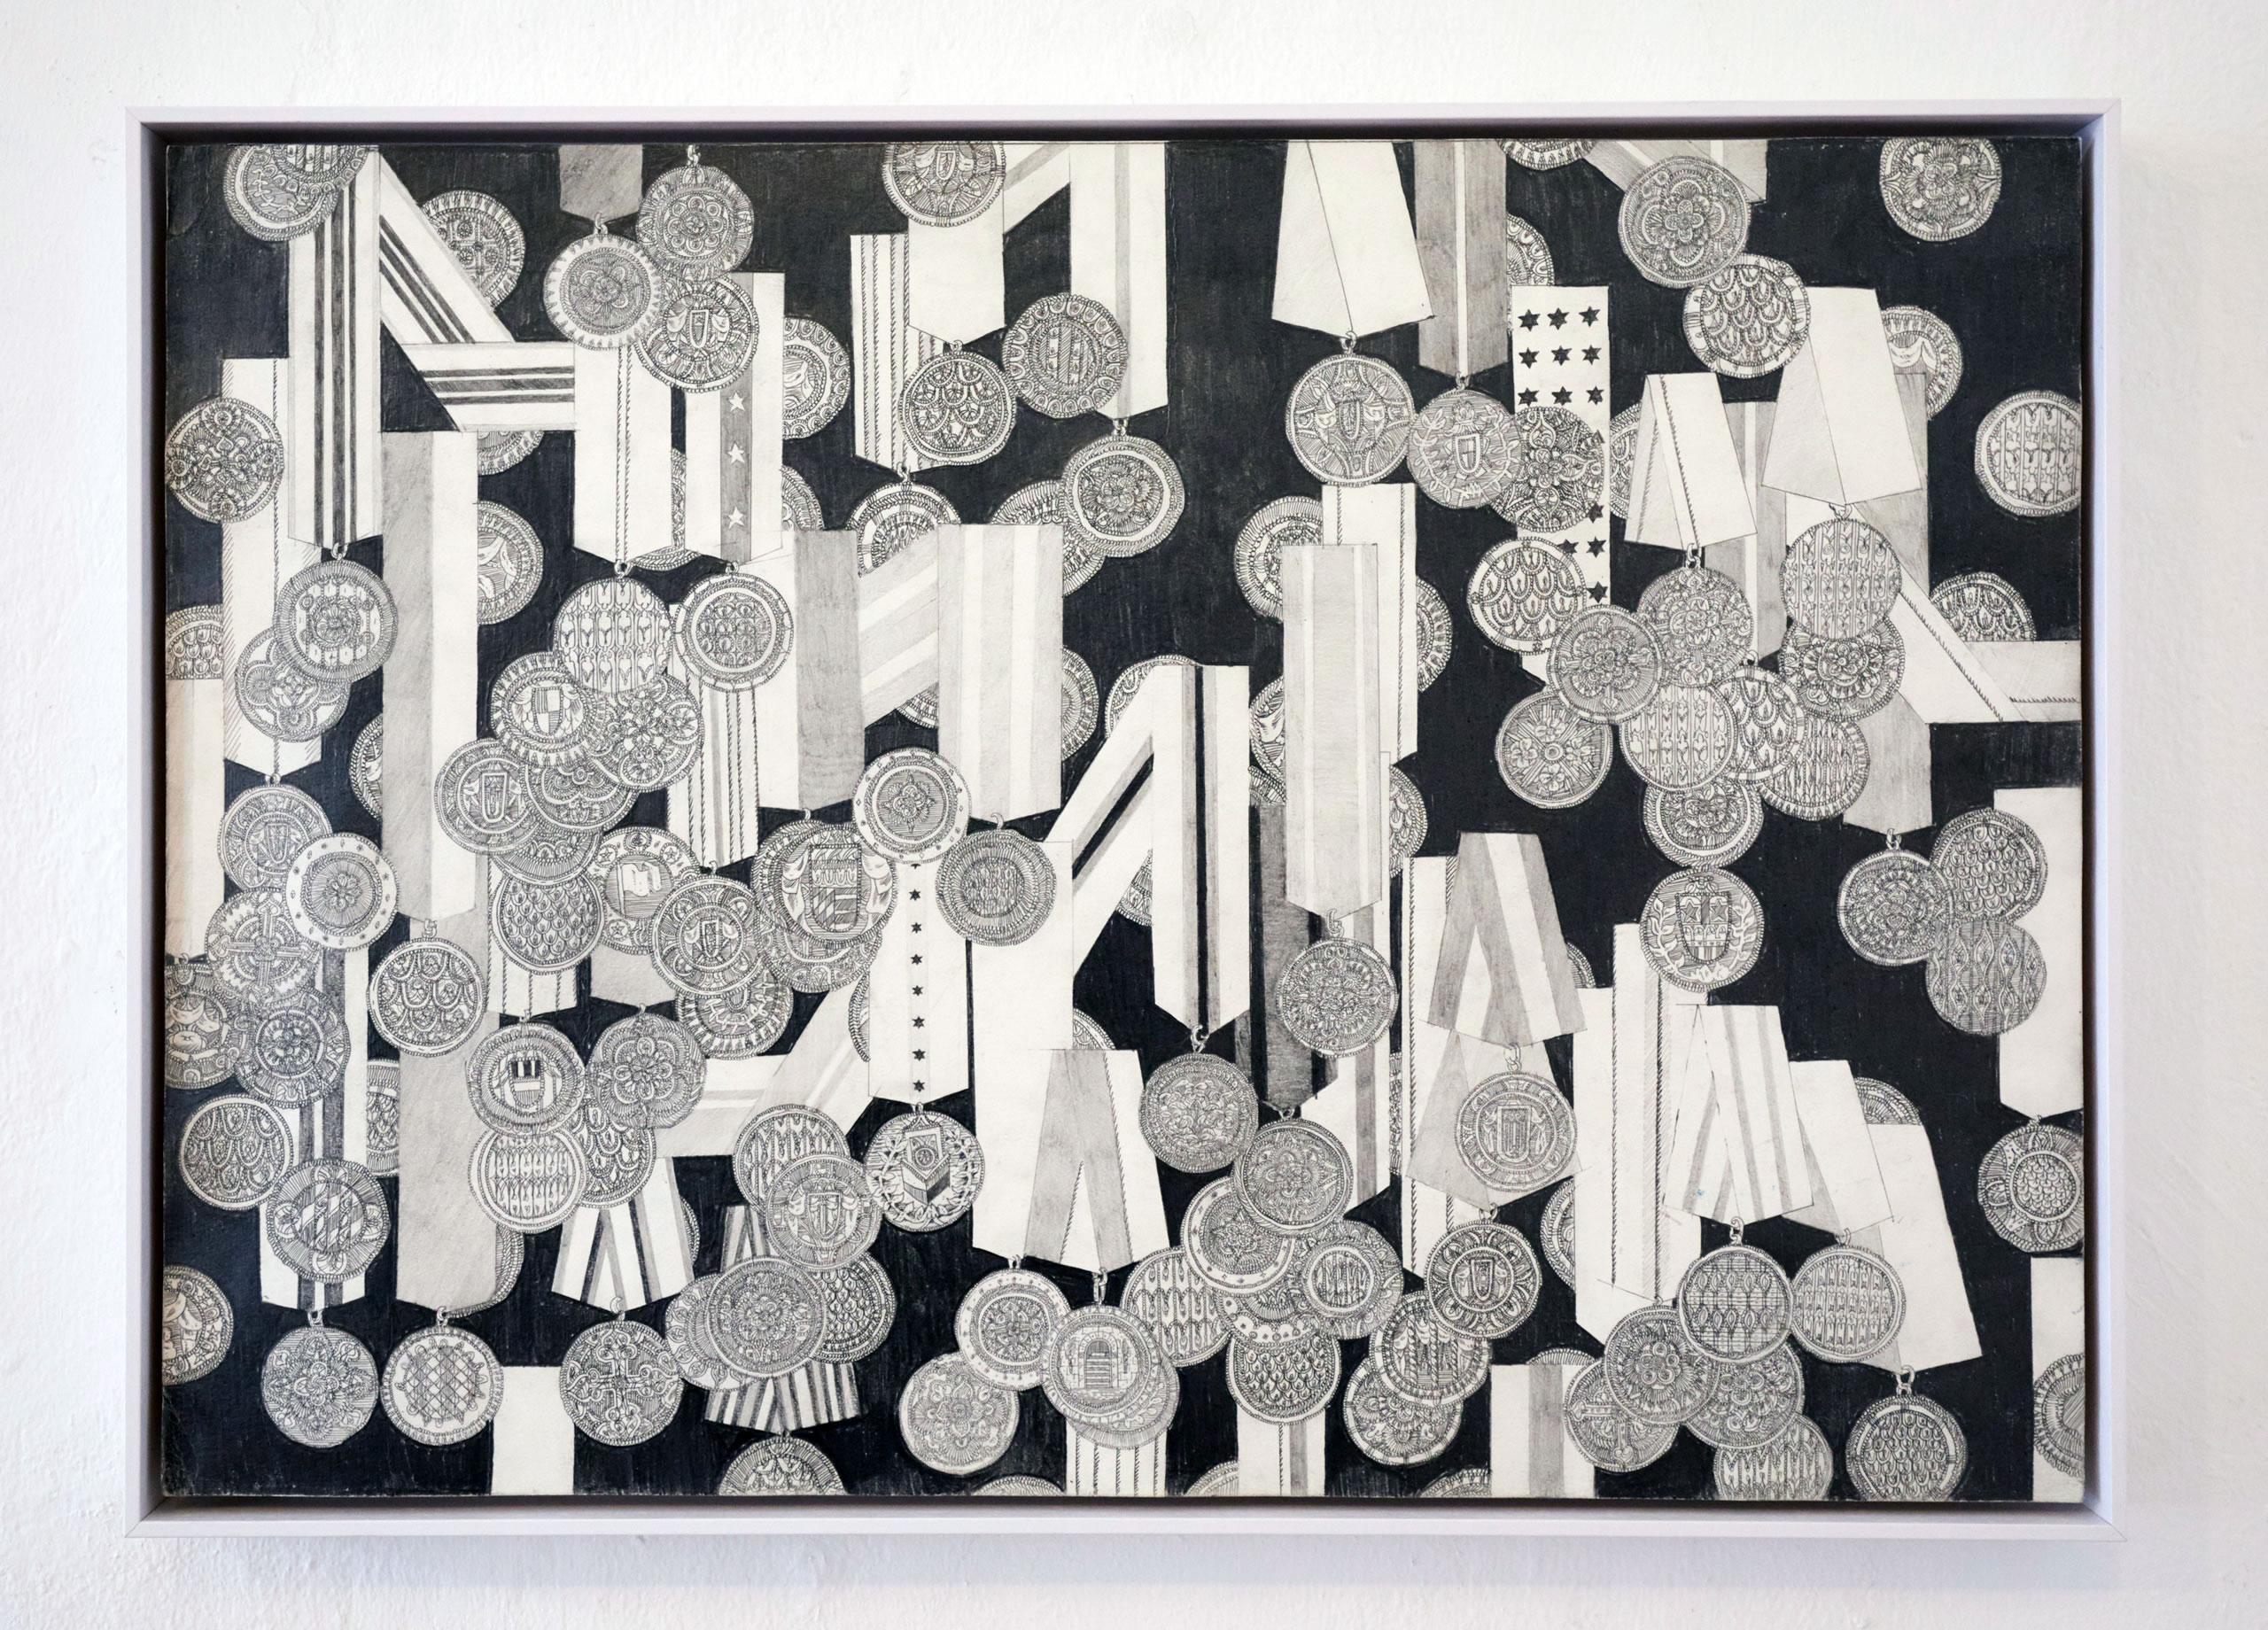 Patrick Roman Scherer | O.T. | 2019 | Bleistift auf Papier | 42 x 59.4 cm | Foto Johannes Puch | Galerie3